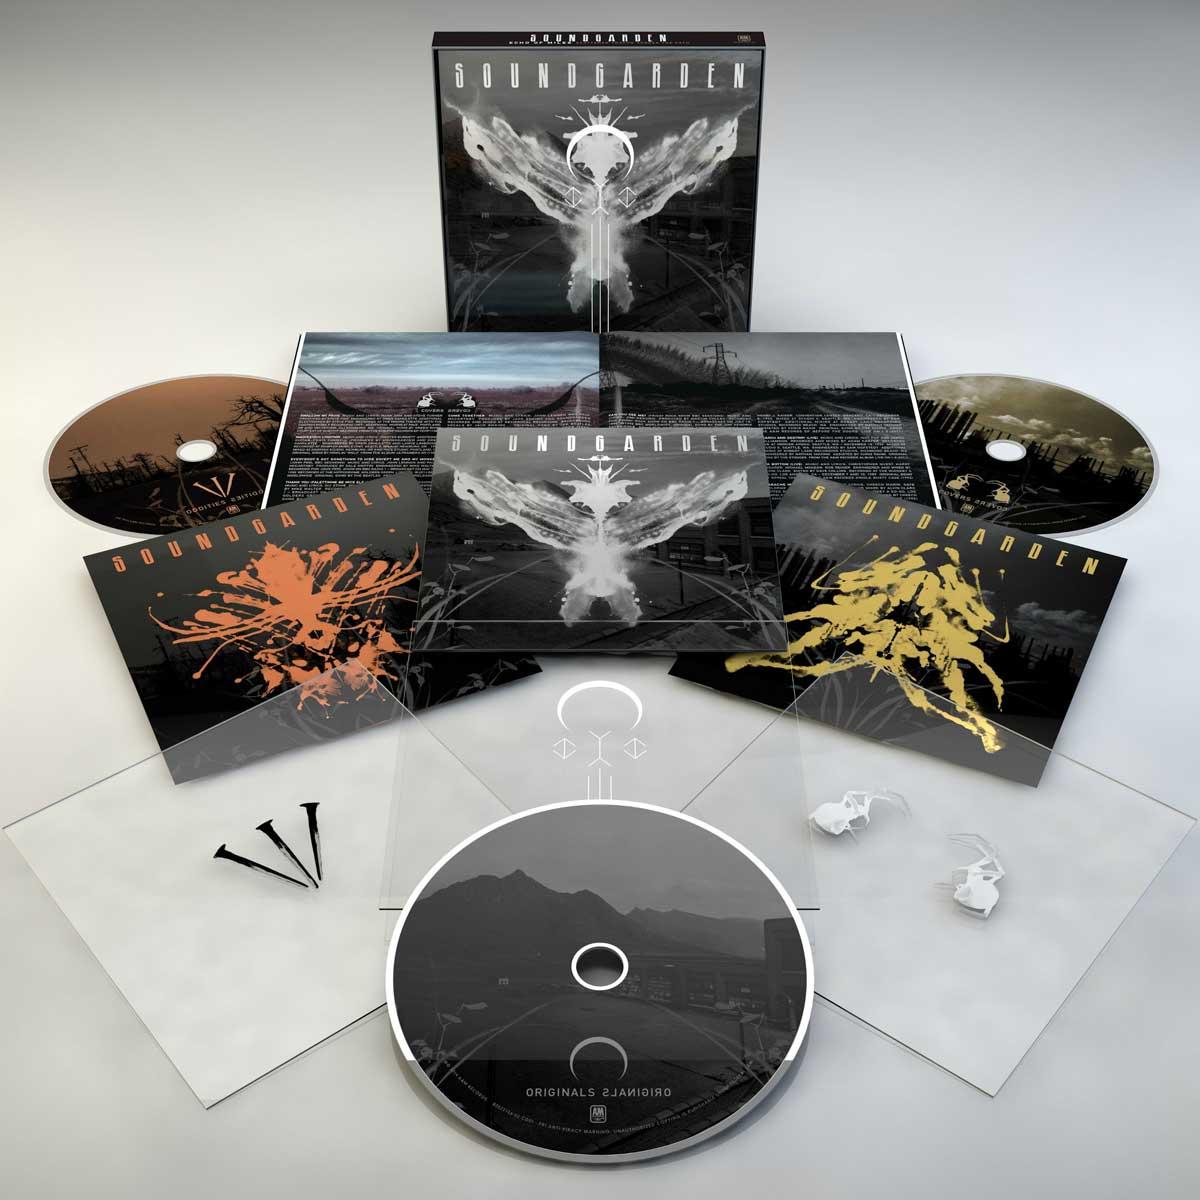 CD BOXSET